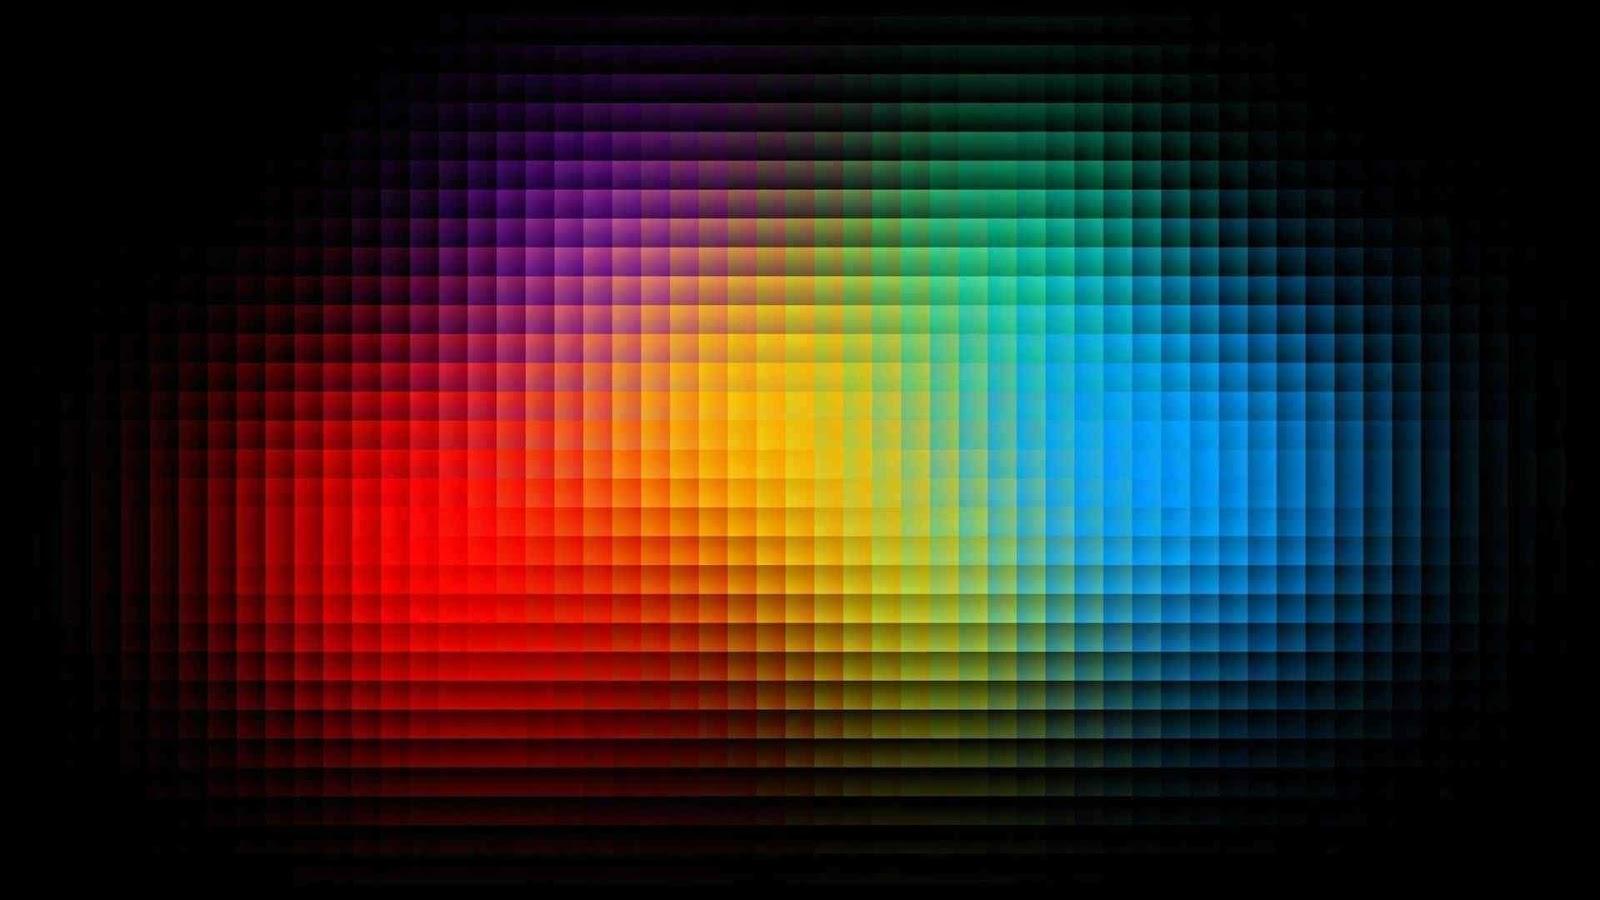 50 4k Hd Colorful Wallpapers For Desktop 2020 We 7